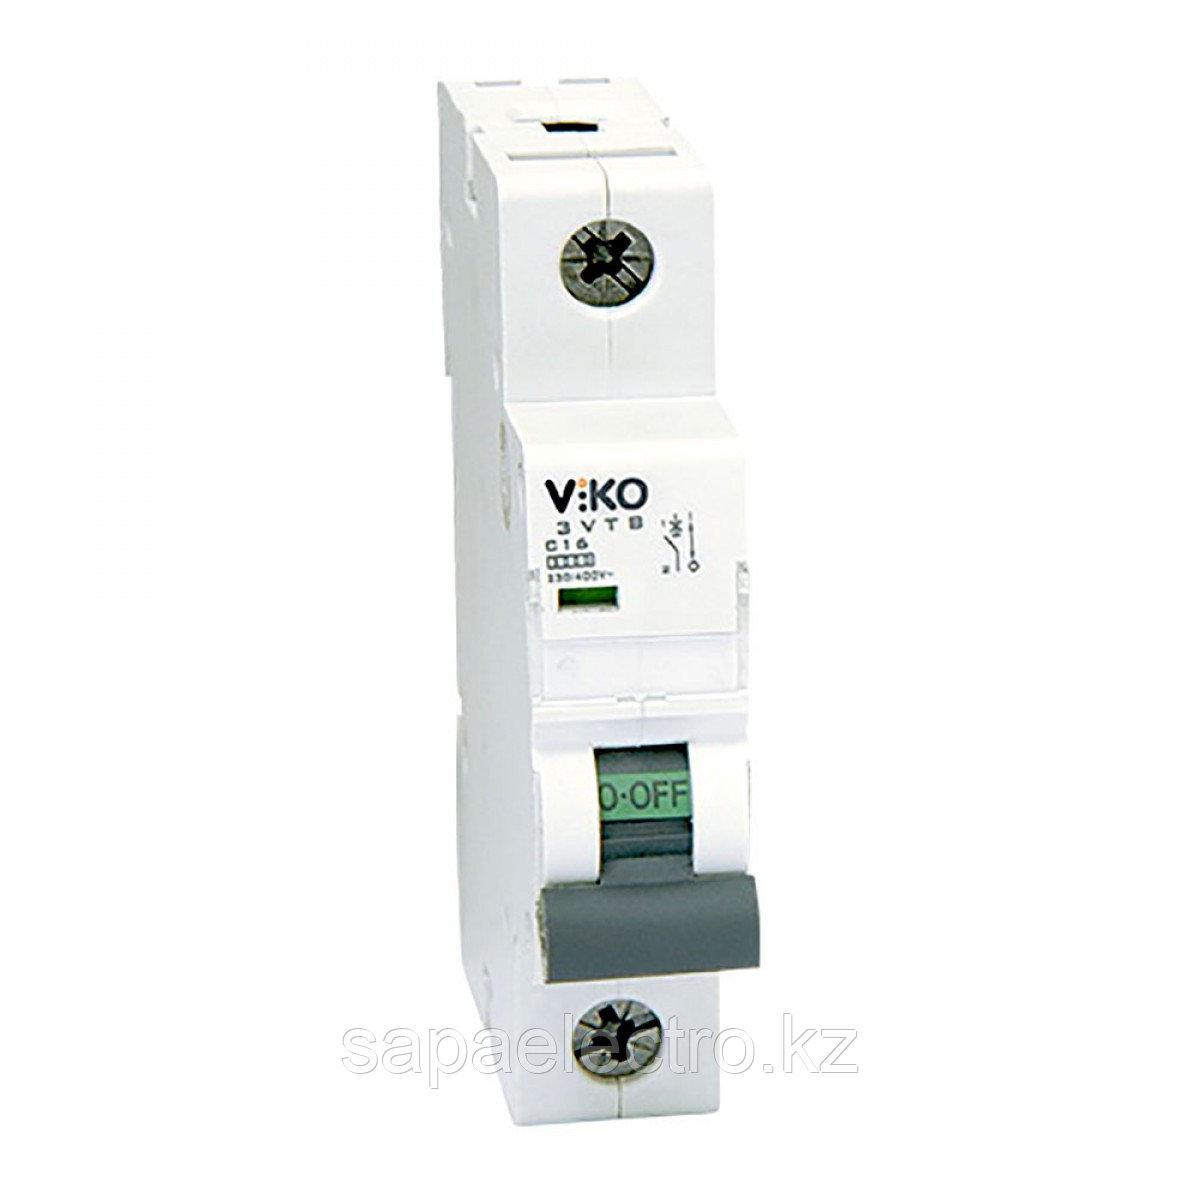 3VTB-1B63  Автомат 1P 63A  3KA  B-C  (VIKO) 120шт